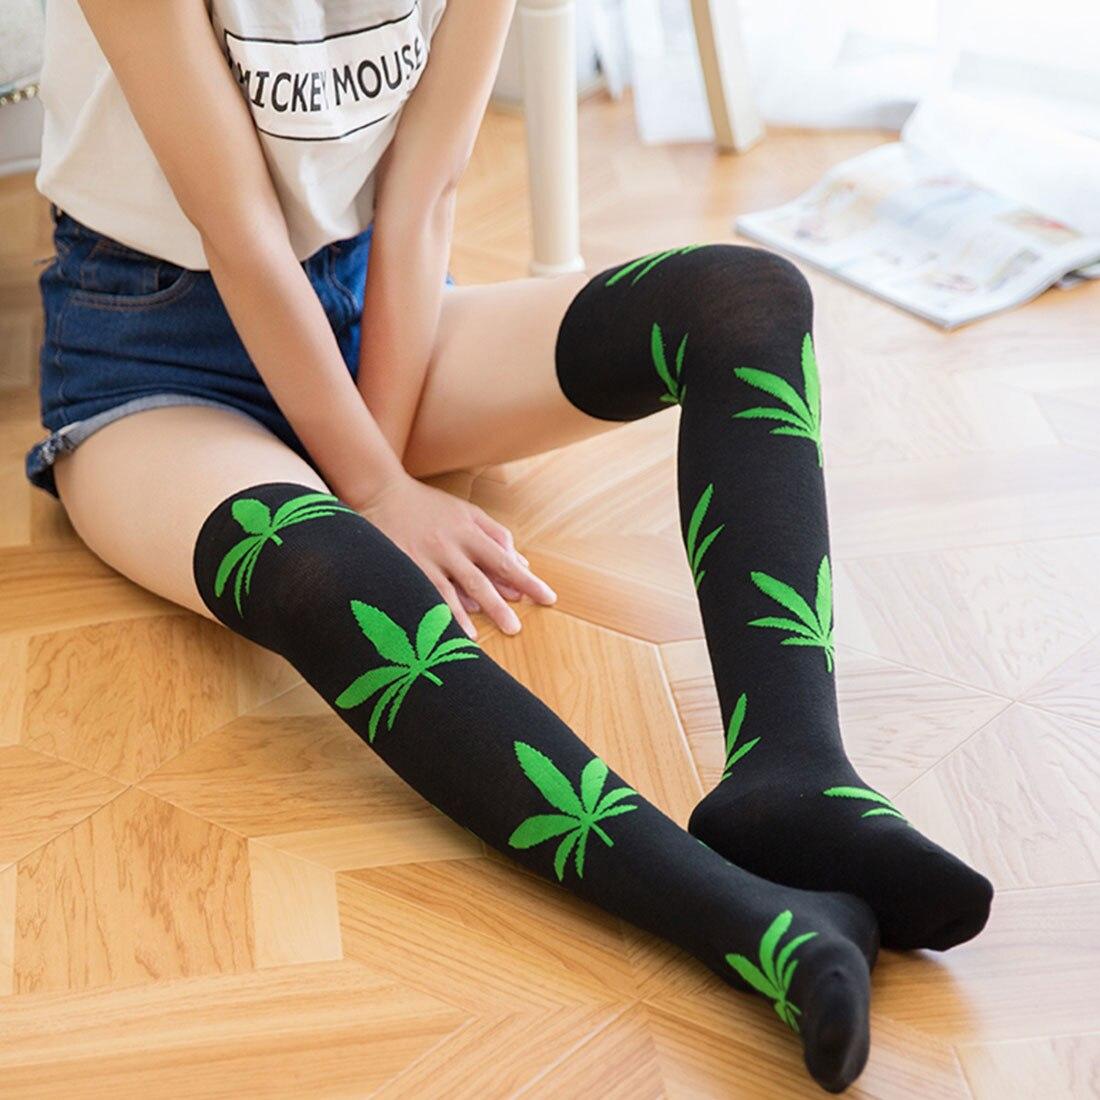 Fashion Kawaii Knee High Socks For Ladies Meias New Maple Leaf Women's Stockings Sexy Harajuku Thigh High Socks Long Knee Socks